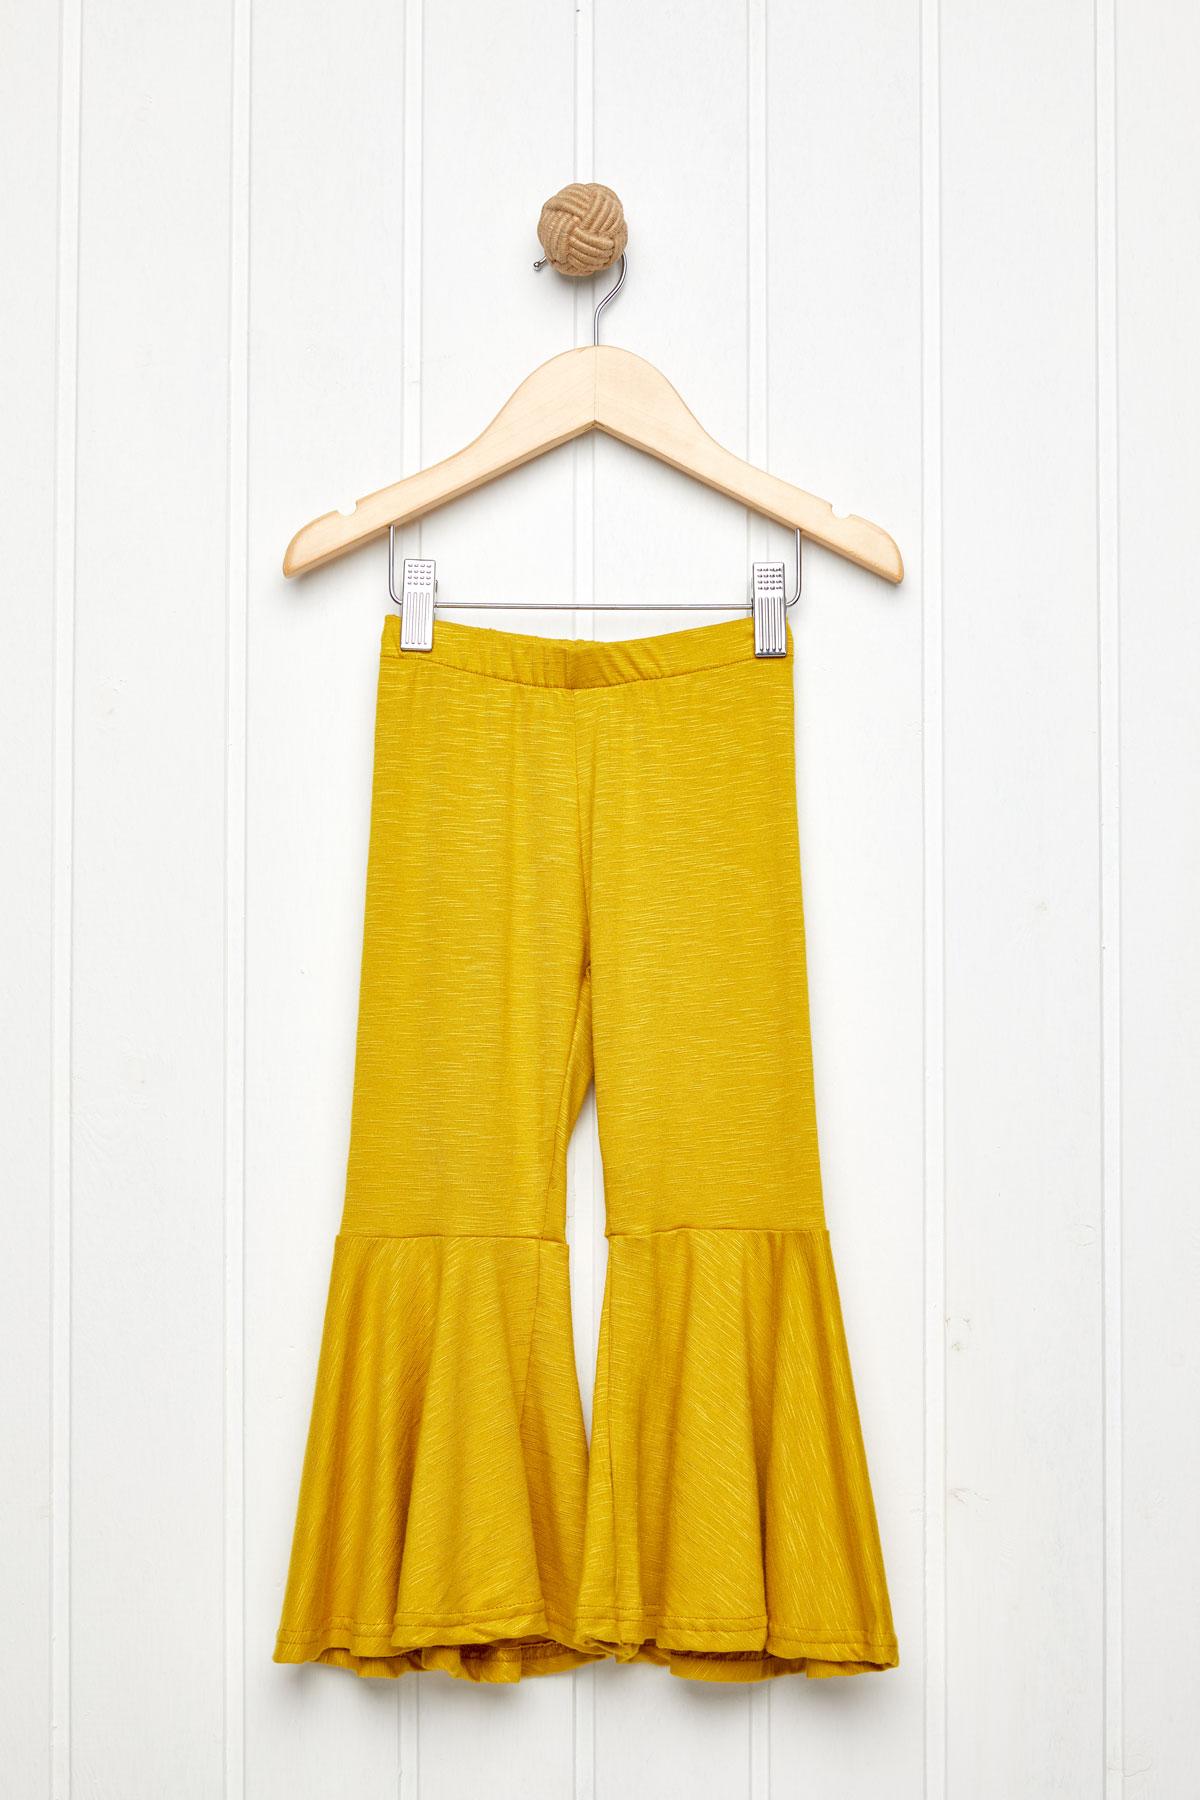 60's παντελόνι ελαστικό ώχρα